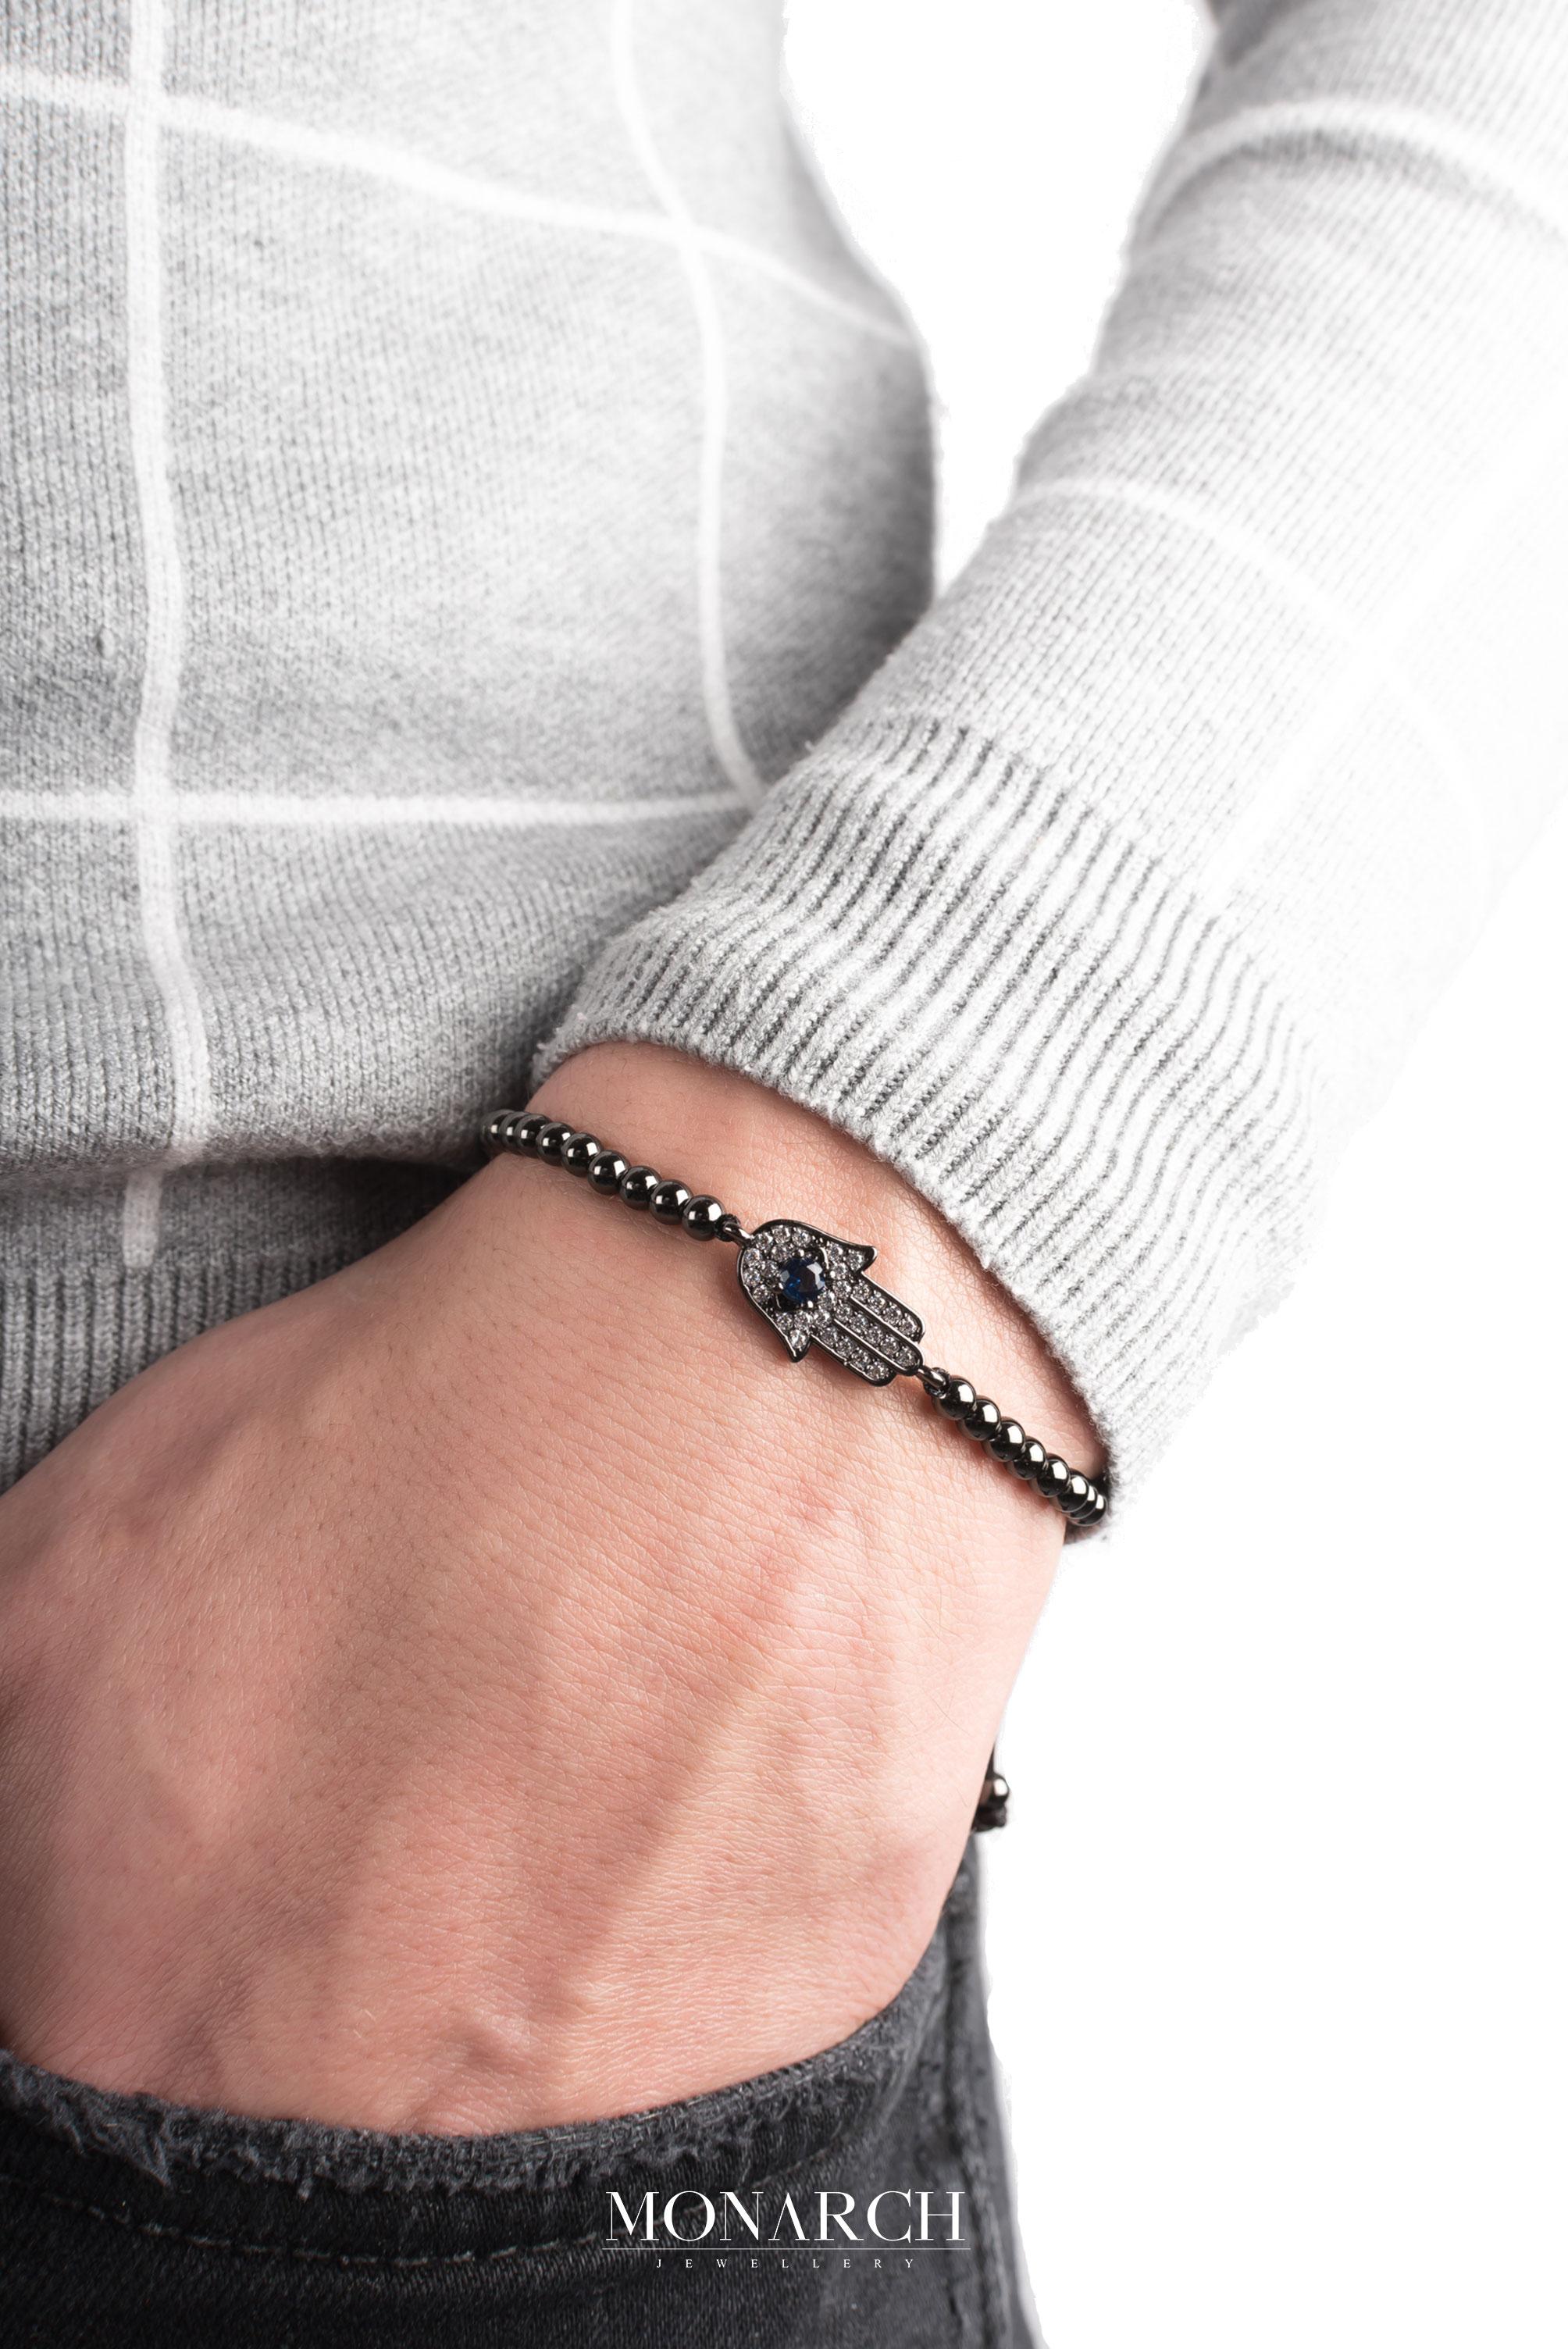 black luxury bracelet for man, monarch jewellery MA62BFTM